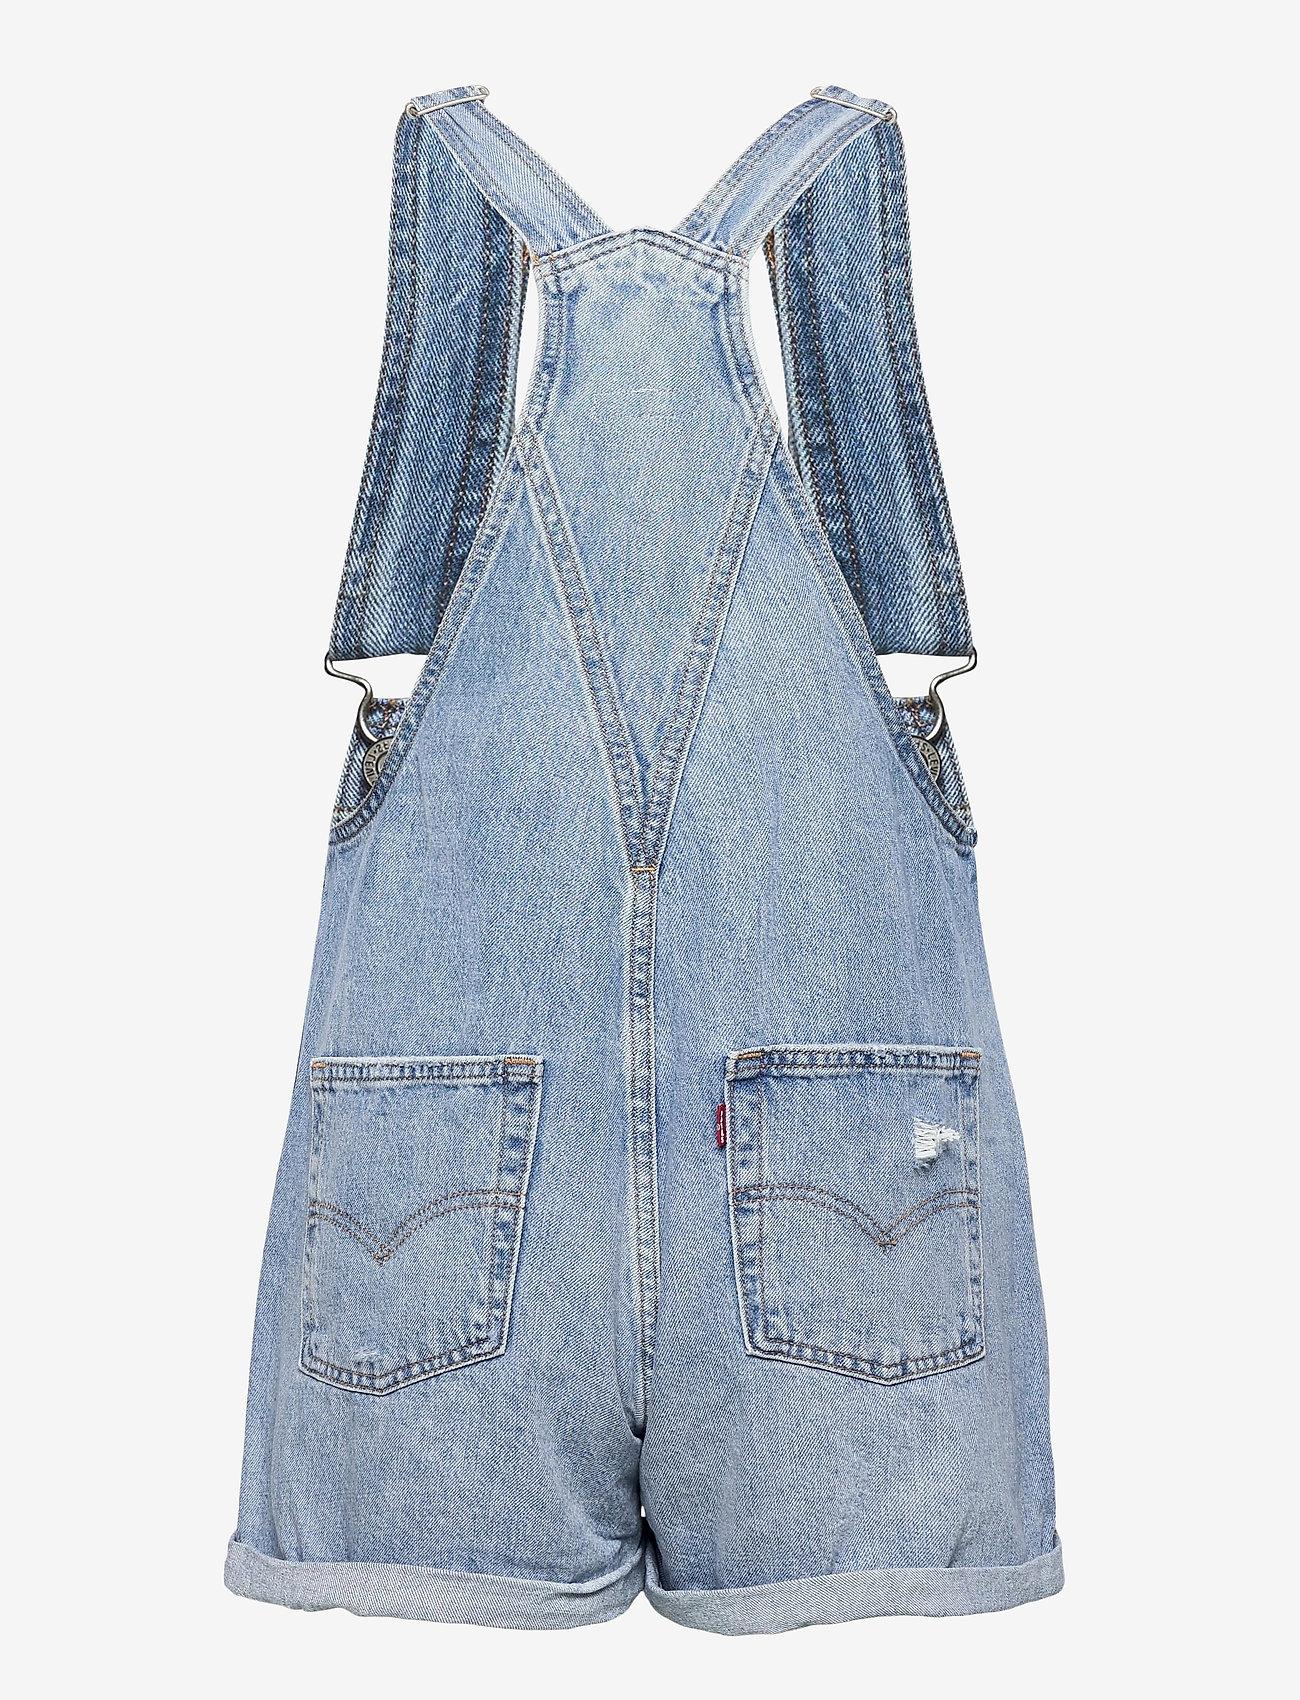 LEVI´S Women - VINTAGE SHORTALL OPEN SKIES - tøj - med indigo - worn in - 1